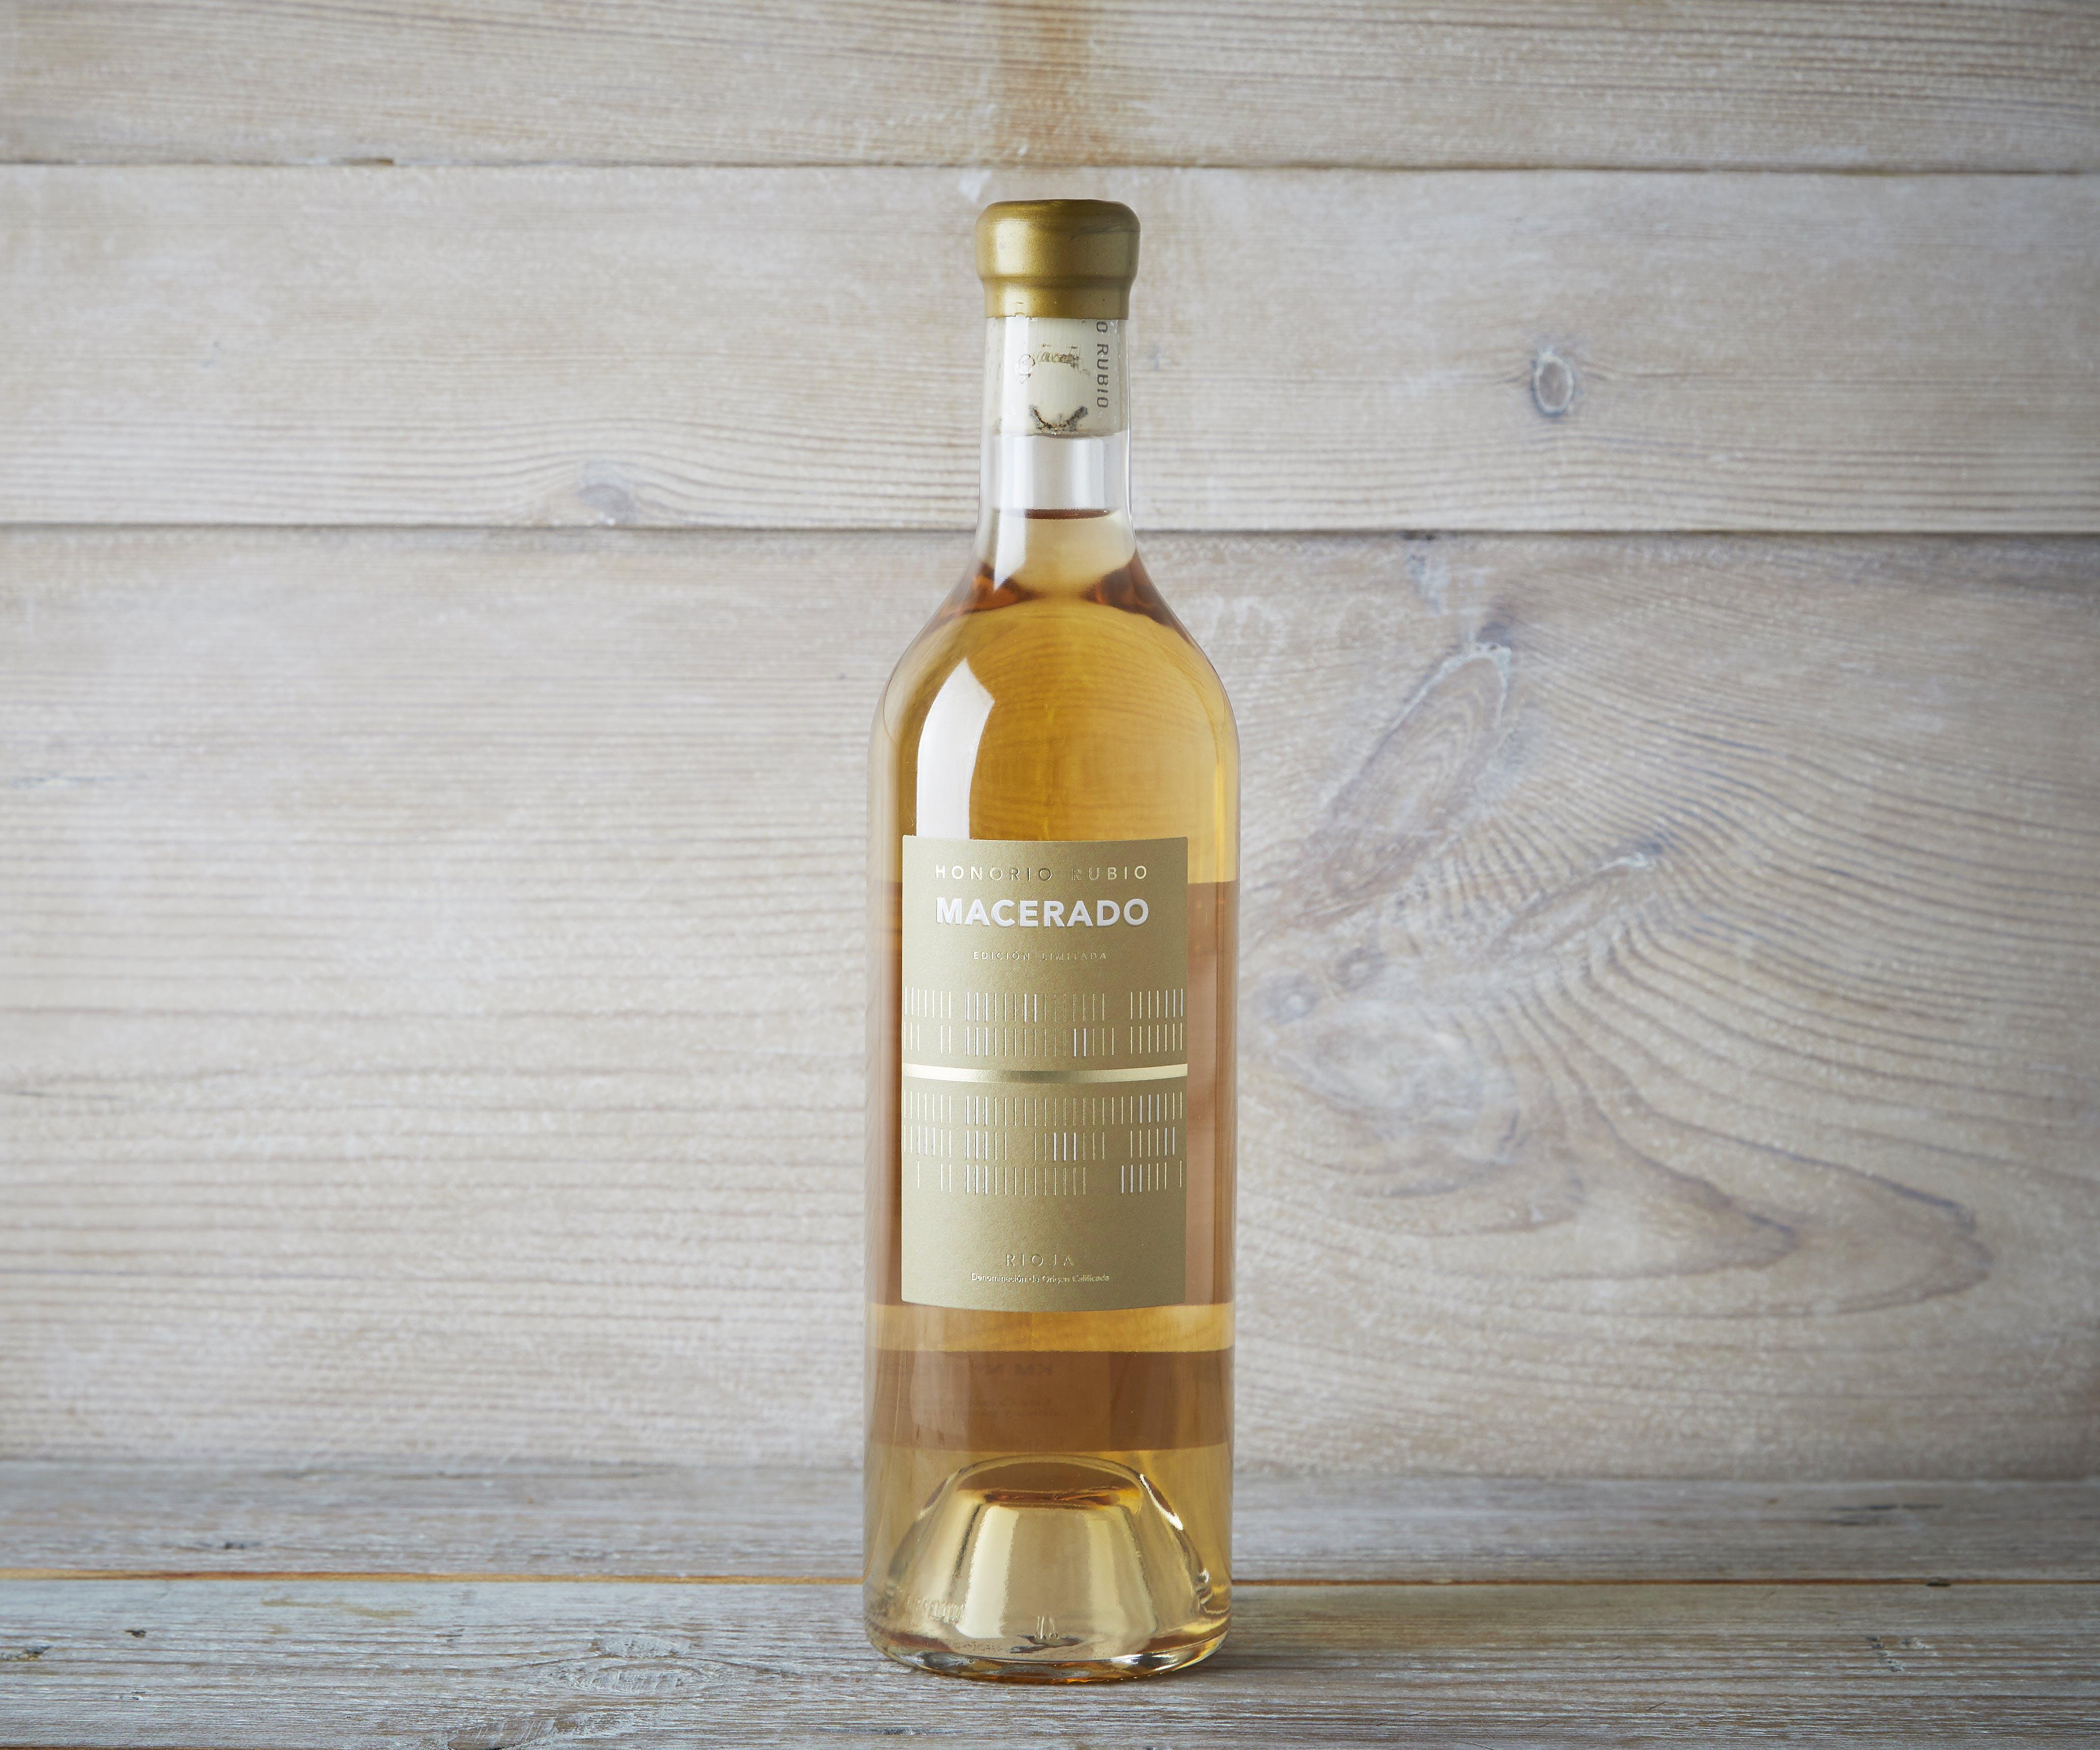 Viura Macerado (Orange wine)